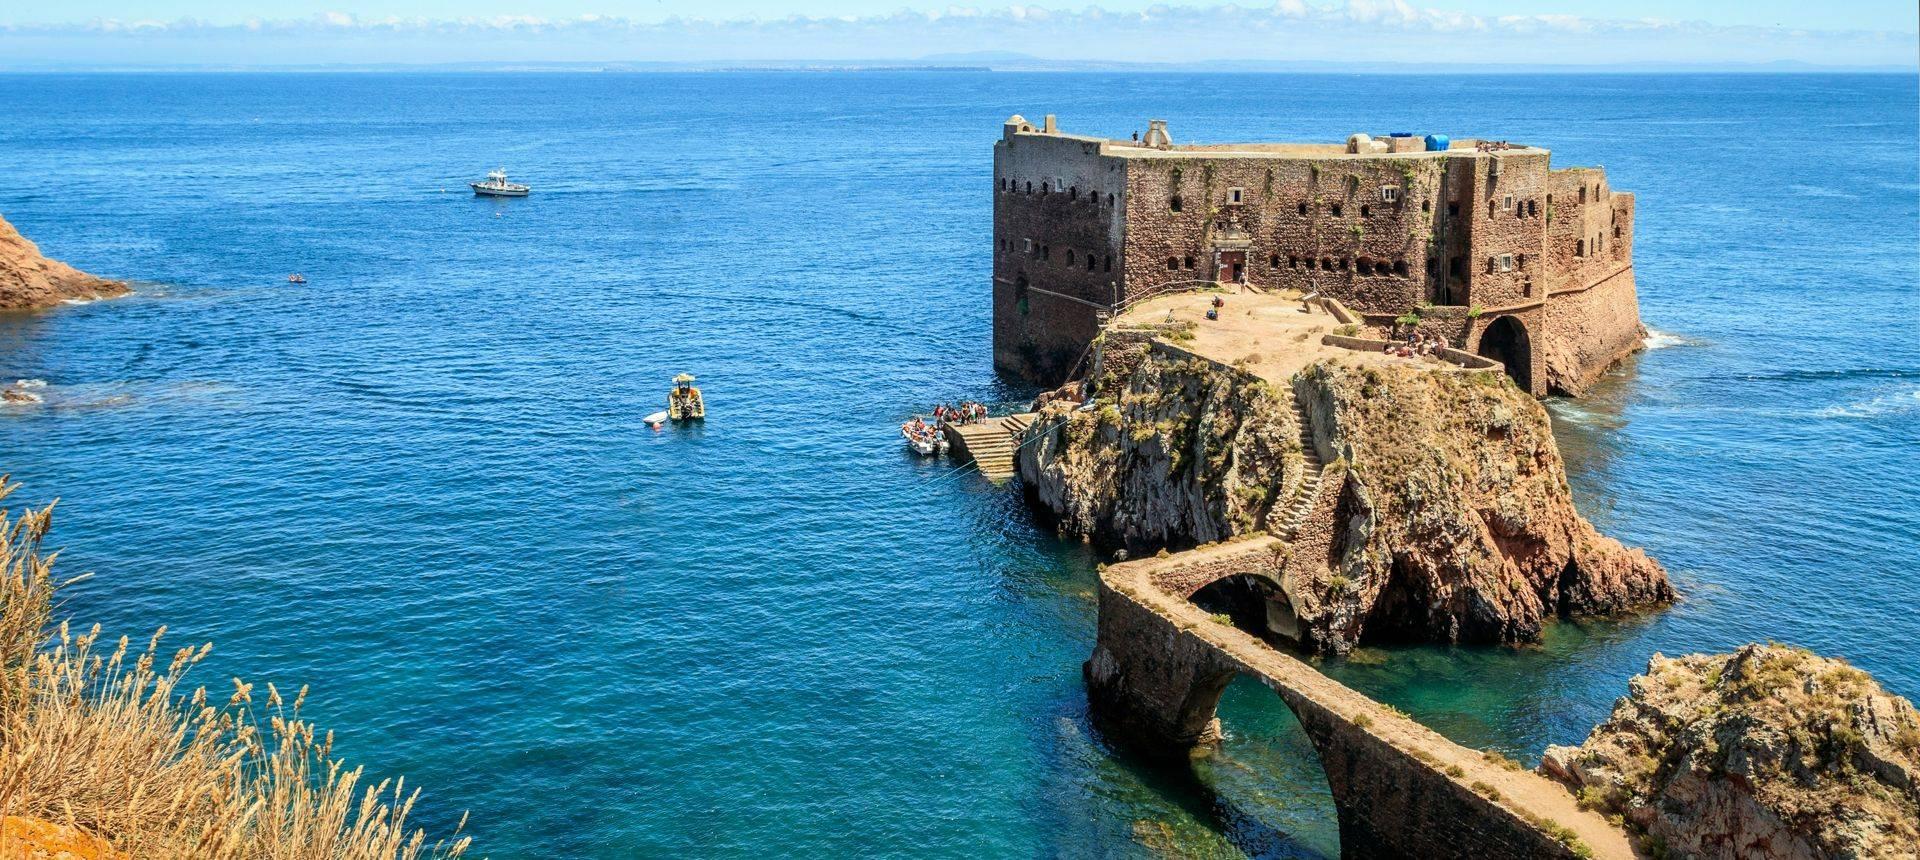 Baptista Fortress, Berlengas Islands, Portugal Shutterstock 1040853943